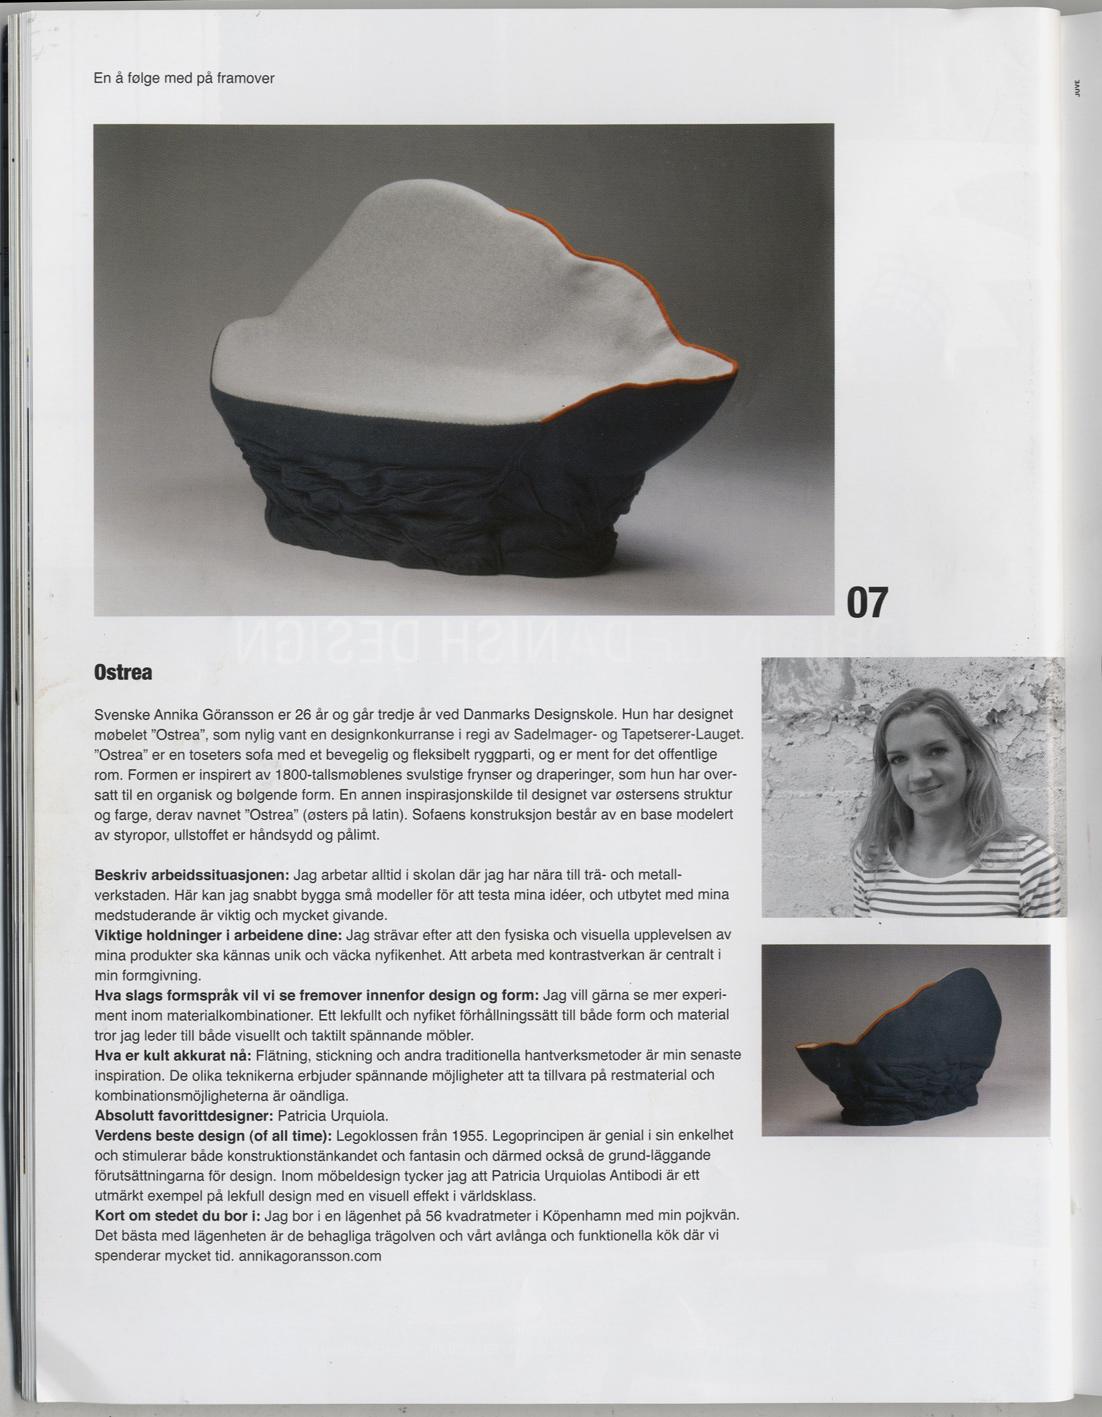 Article in Norwegian magazine  Nytt Rom.